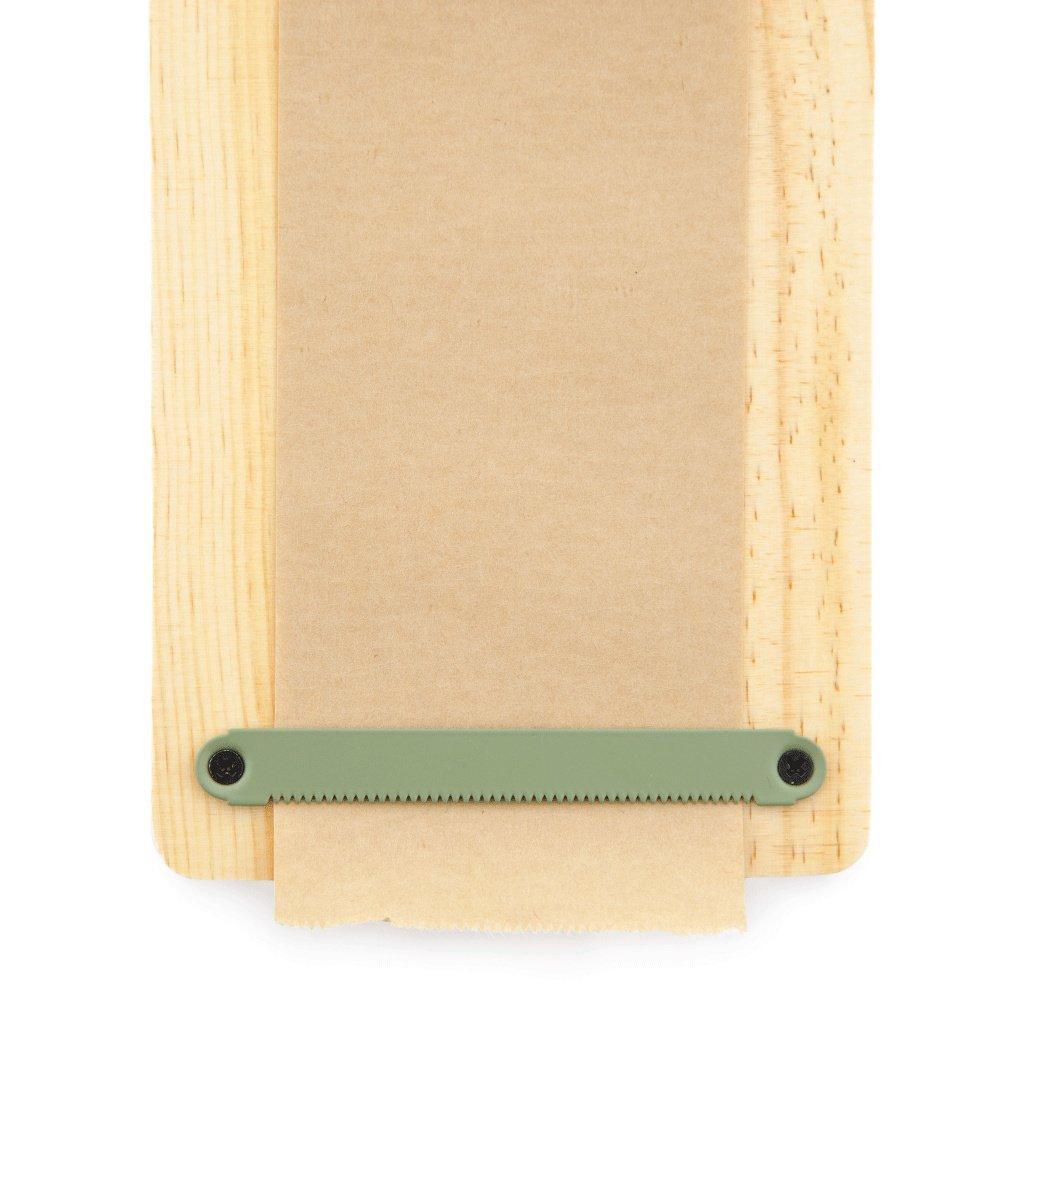 Kraft Paper Roller S - Groen-6